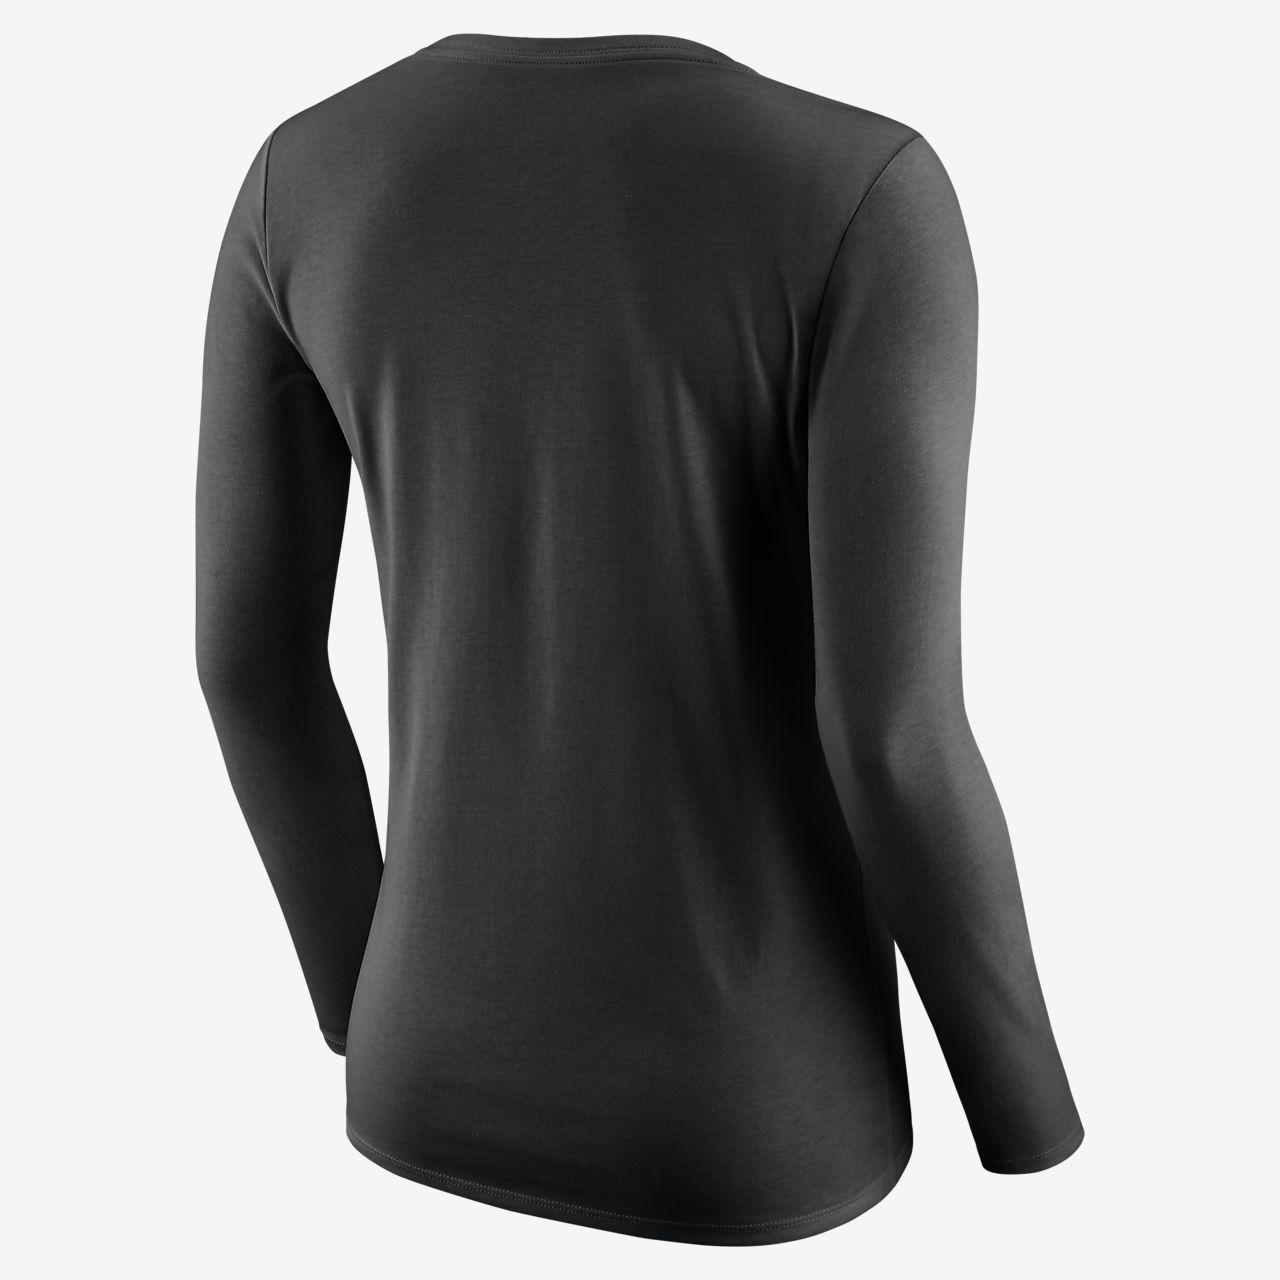 6af45f46e119 Los Angeles Lakers Nike Dri-FIT Logo Women s Long-Sleeve NBA T-Shirt ...